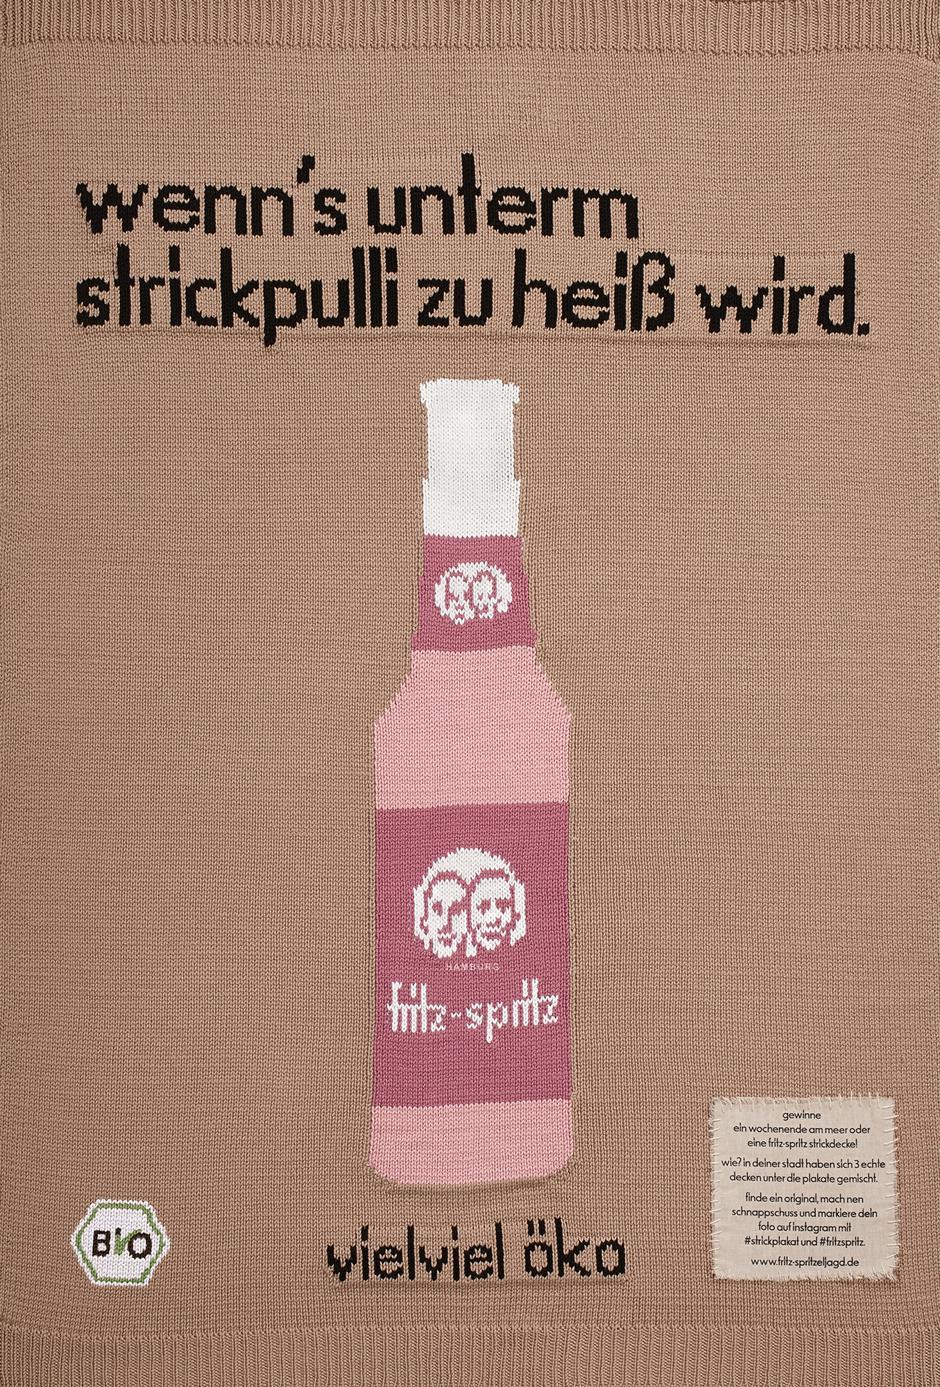 fritz kola blood actvertising sagt mit selbstgestrickten plakaten goodbye. Black Bedroom Furniture Sets. Home Design Ideas